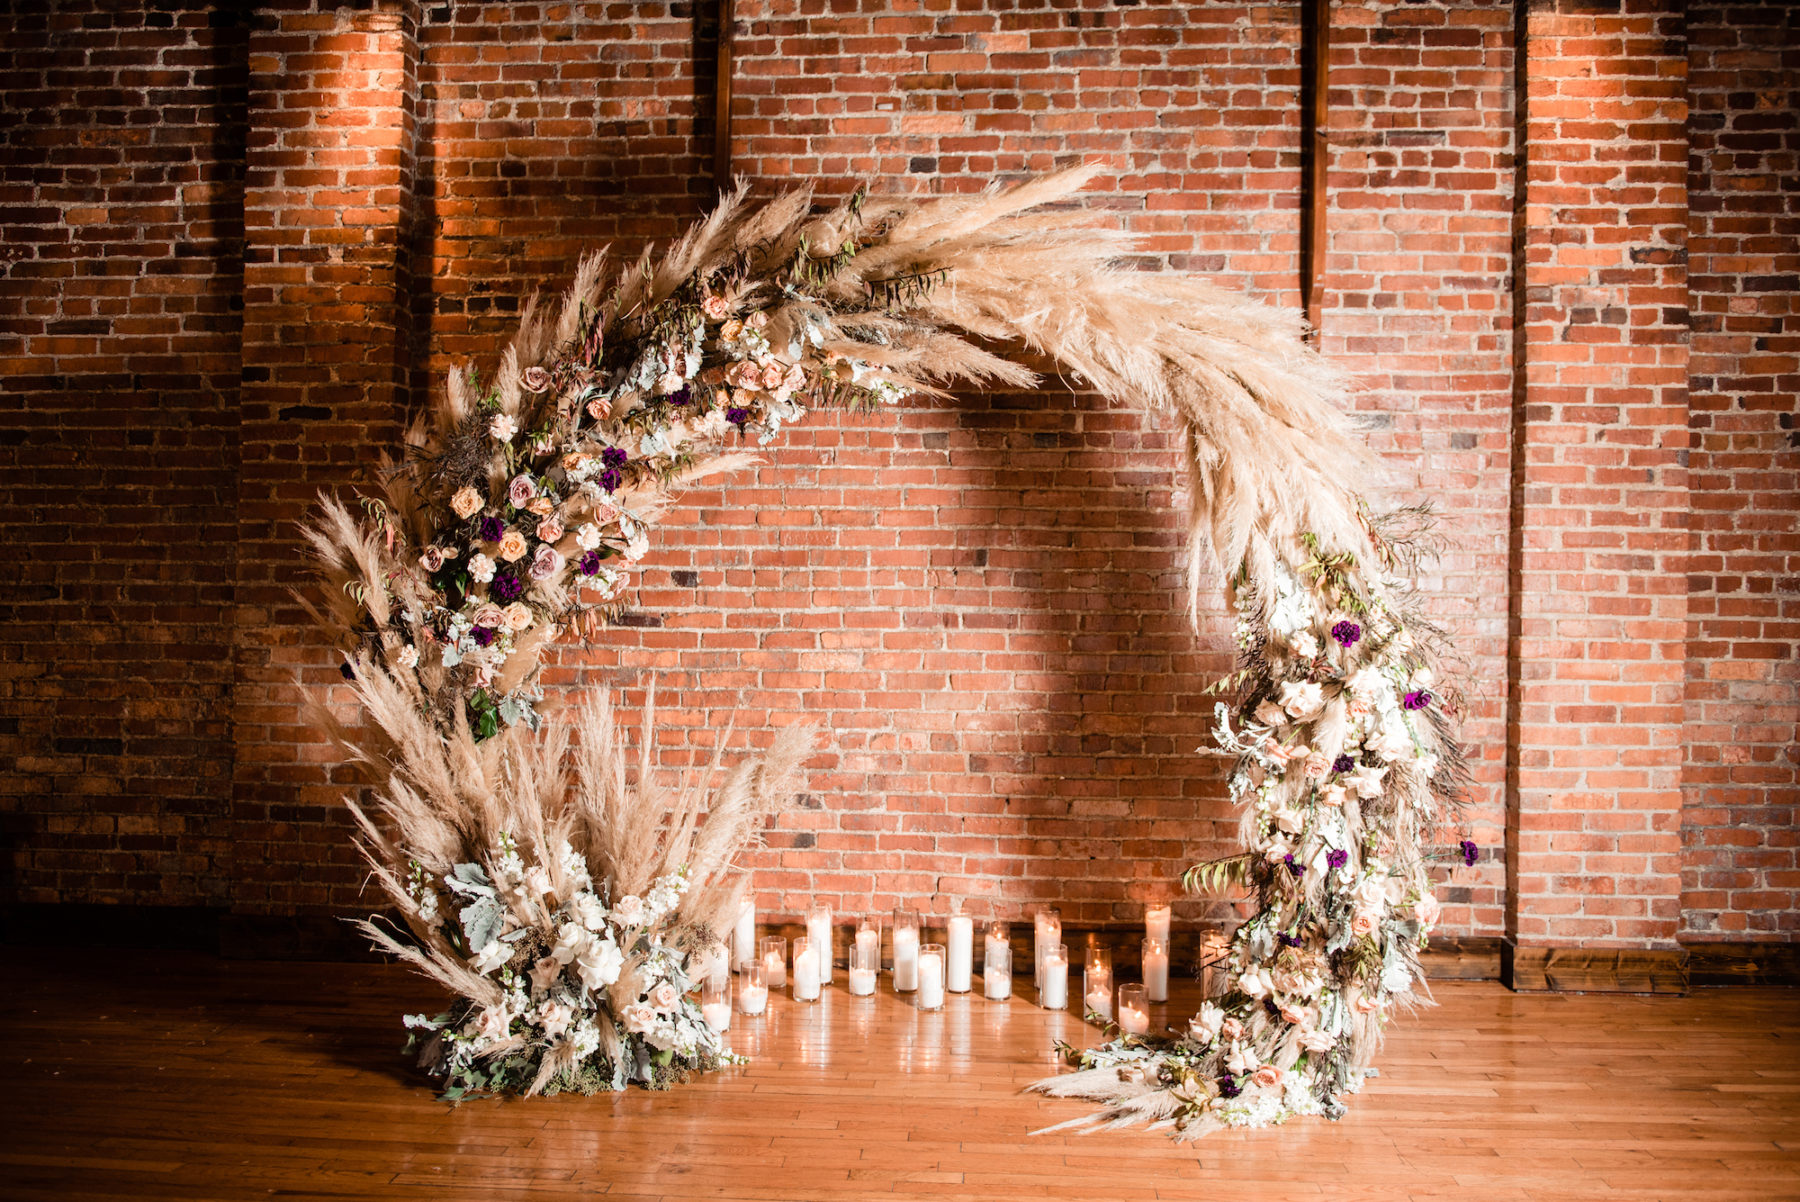 Wedding Floral Arch: Nashville wedding planner Amy & I Designs featured on Nashville Bride Guide